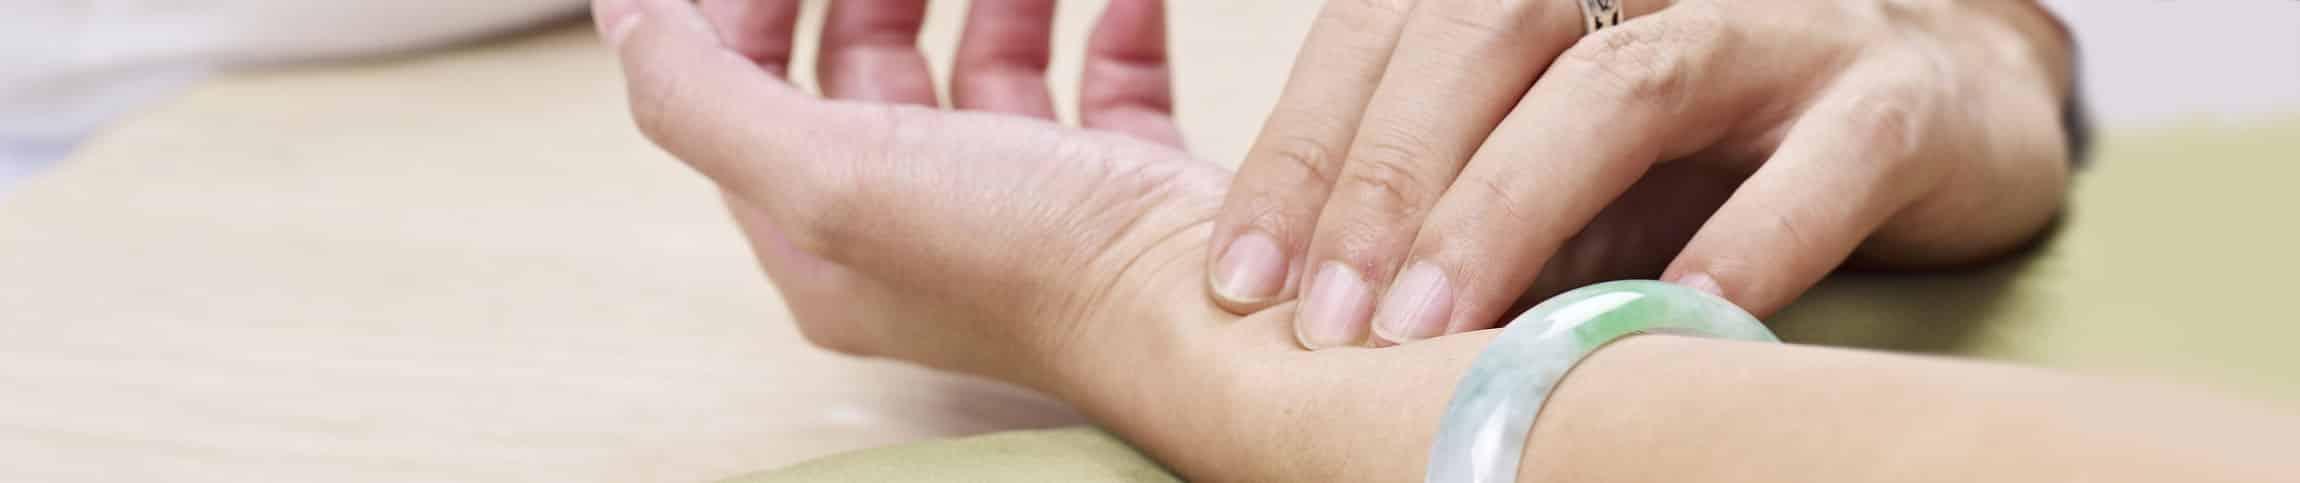 Pulsdiagnose im Ayurveda